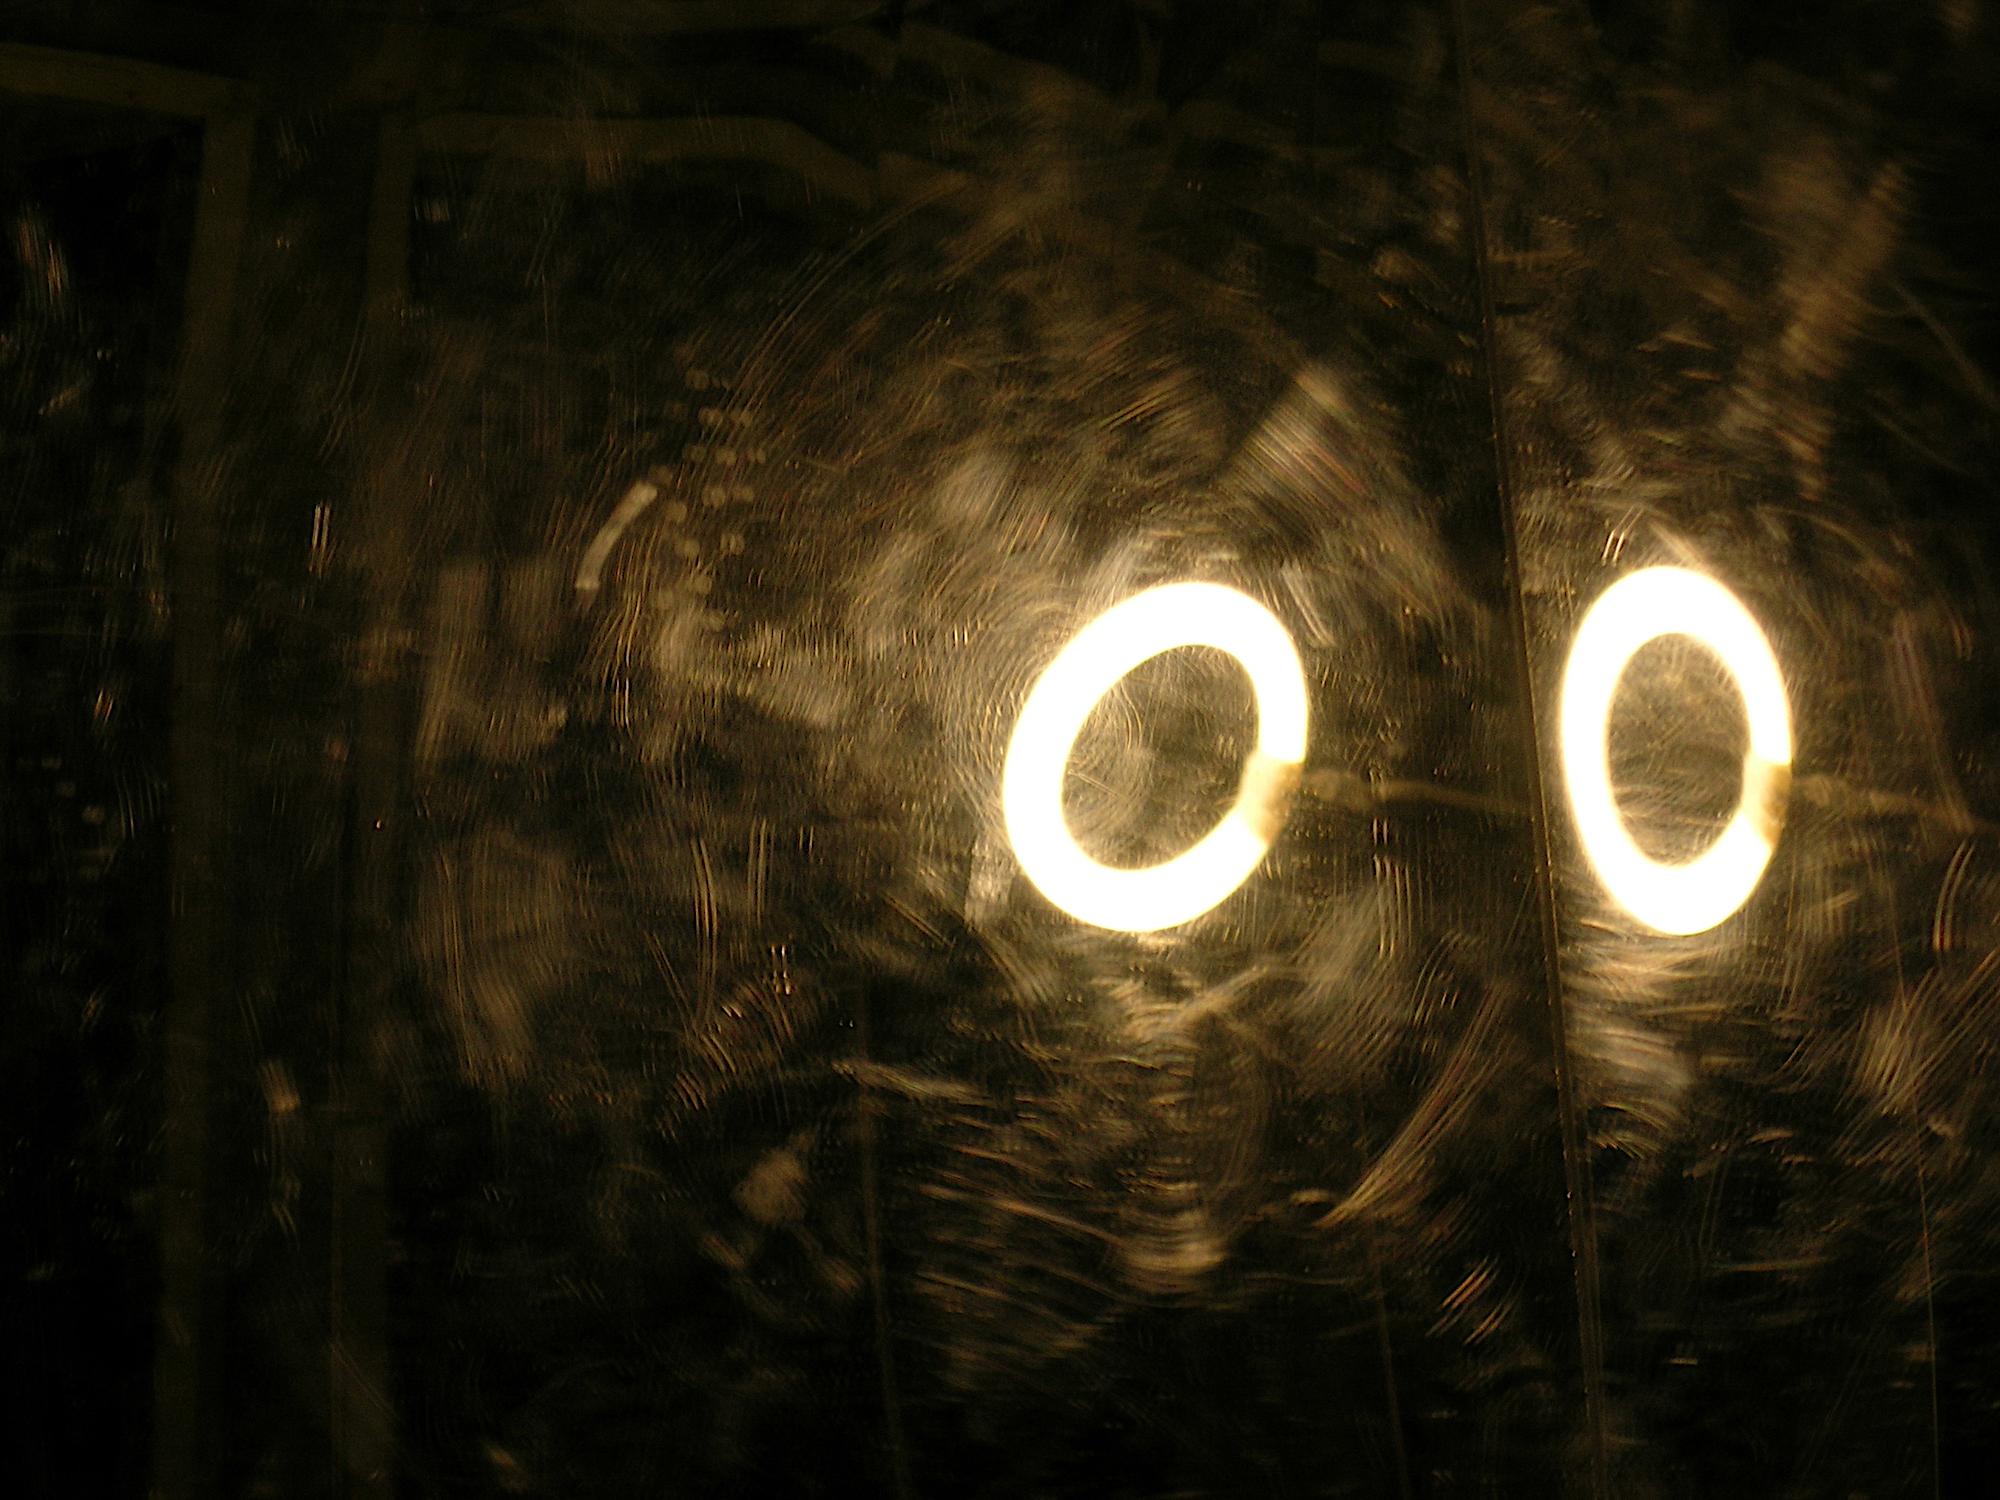 eleanor-bell-light-artist-infinity-light-ring-eclipse-cornwall-design-season.jpg